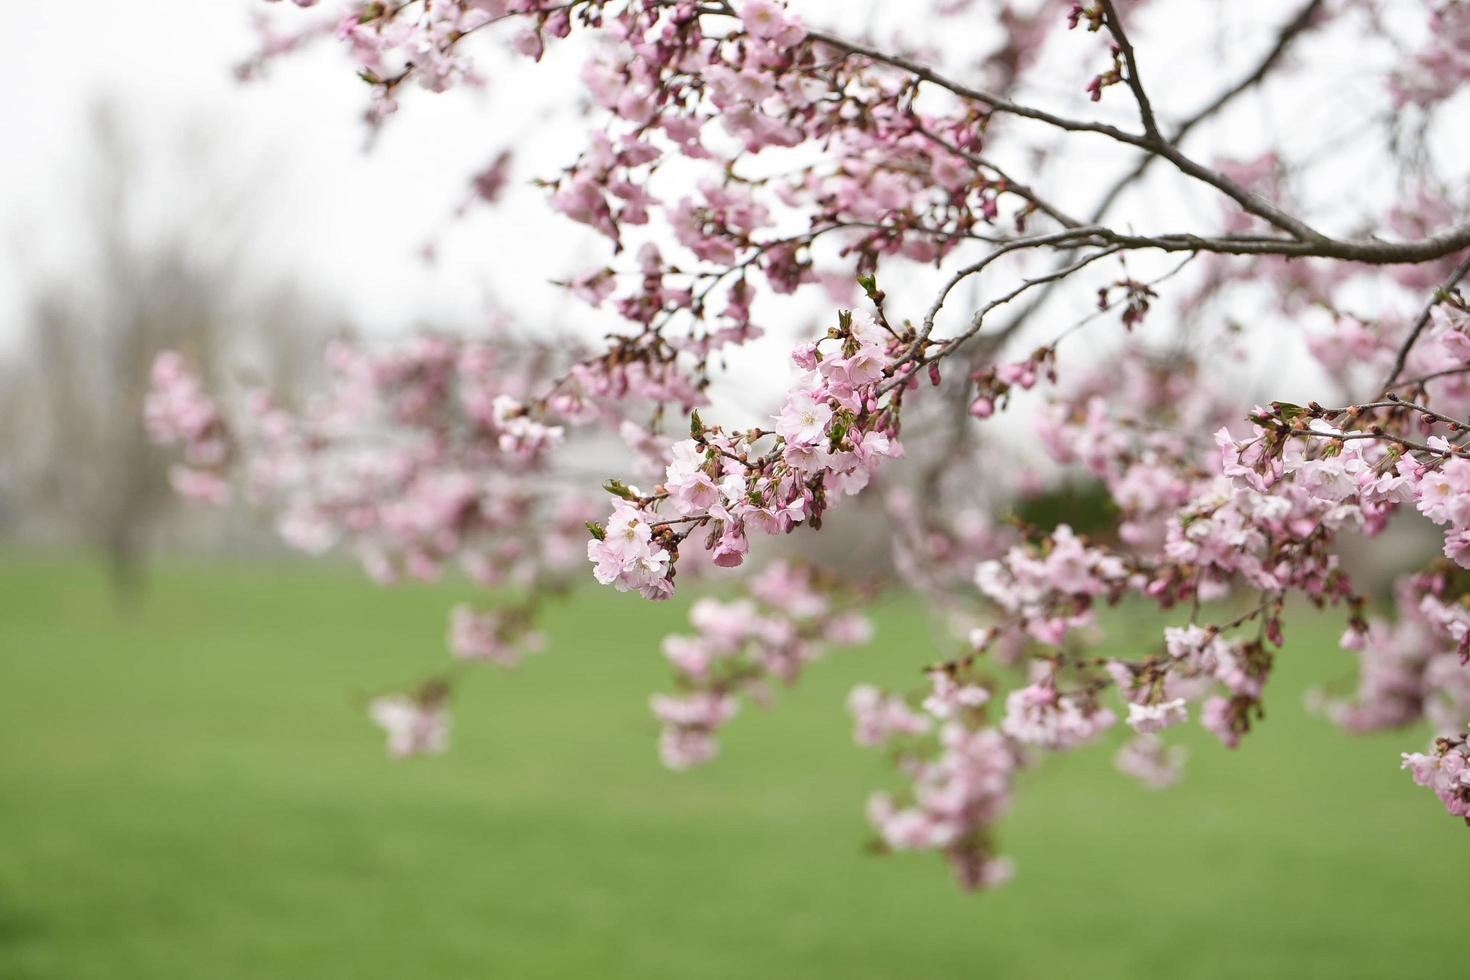 rosa Kirschblütenbaum im Feld foto